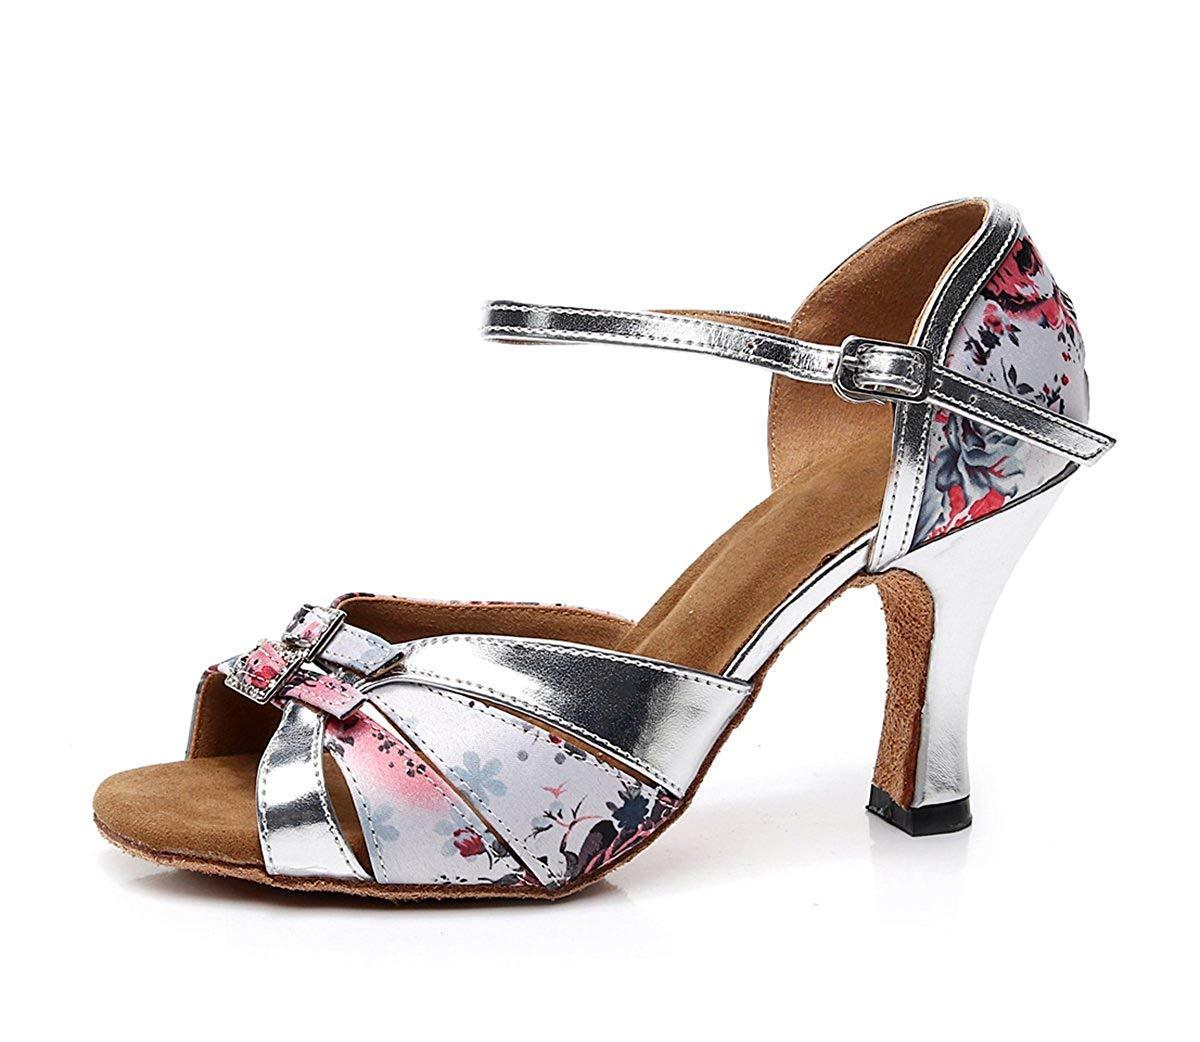 TJ7138 Damen Mädchen Blaumendruck Knoten HellRosa Synthetische Latin Dance Schuhe Hochzeit Sandalen UK 7 5 (Farbe   - Größe   -)